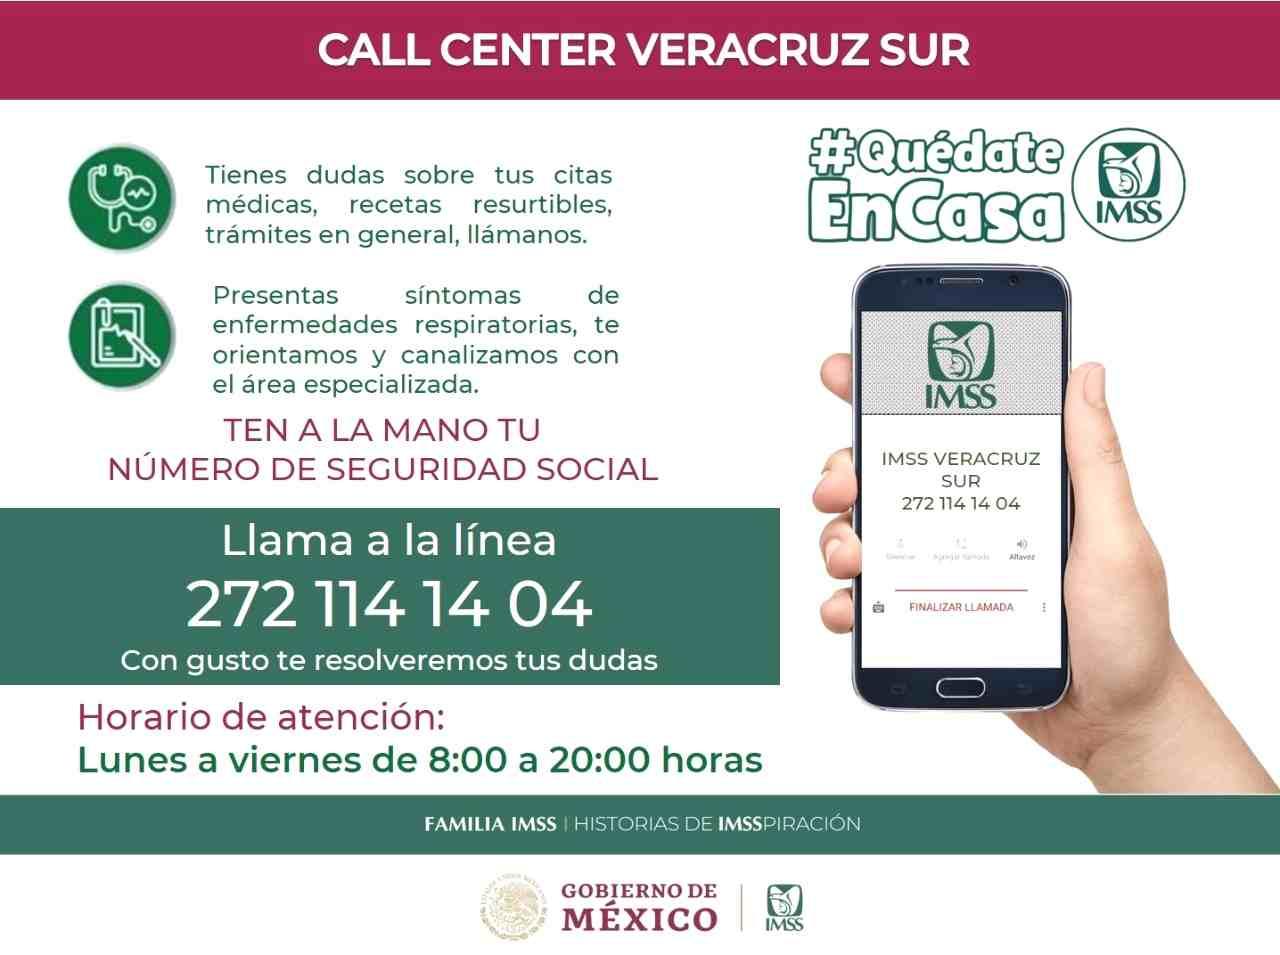 ABRE IMSS LÍNEA DE ATENCIÓN TELEFÓNICA